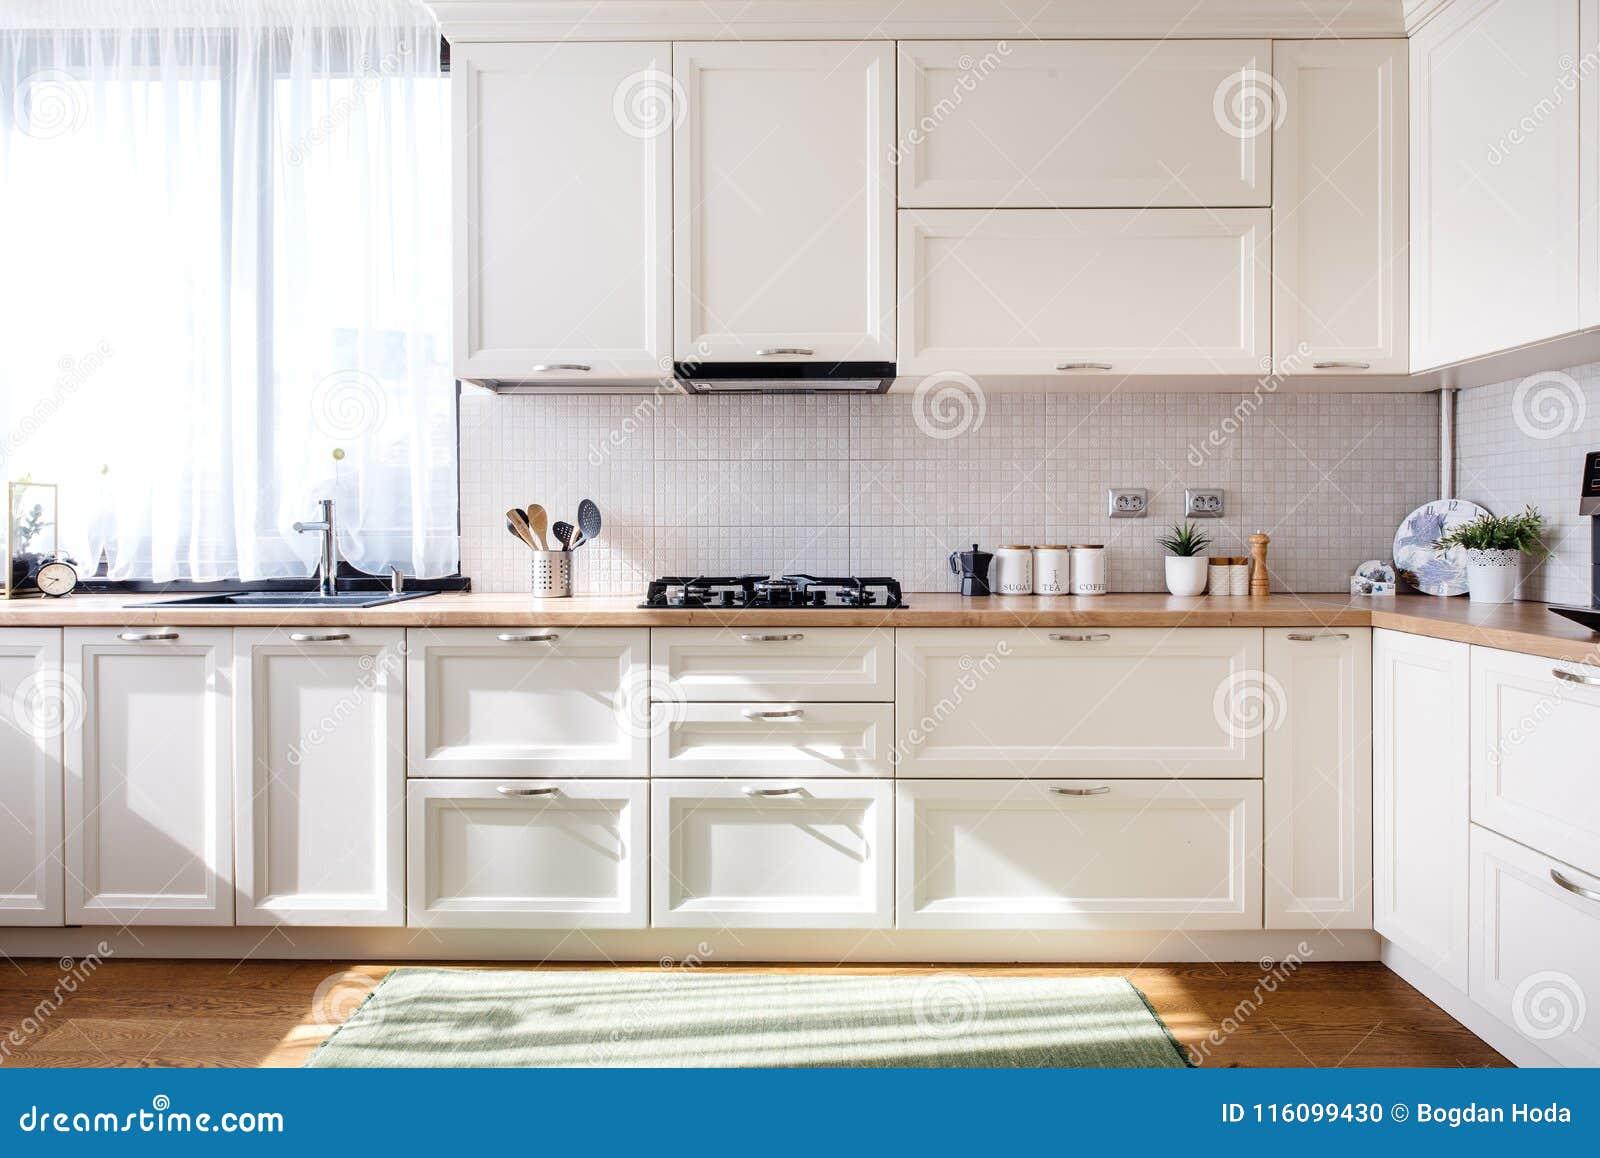 Modern keuken binnenlands ontwerp met wit meubilair en moderne details